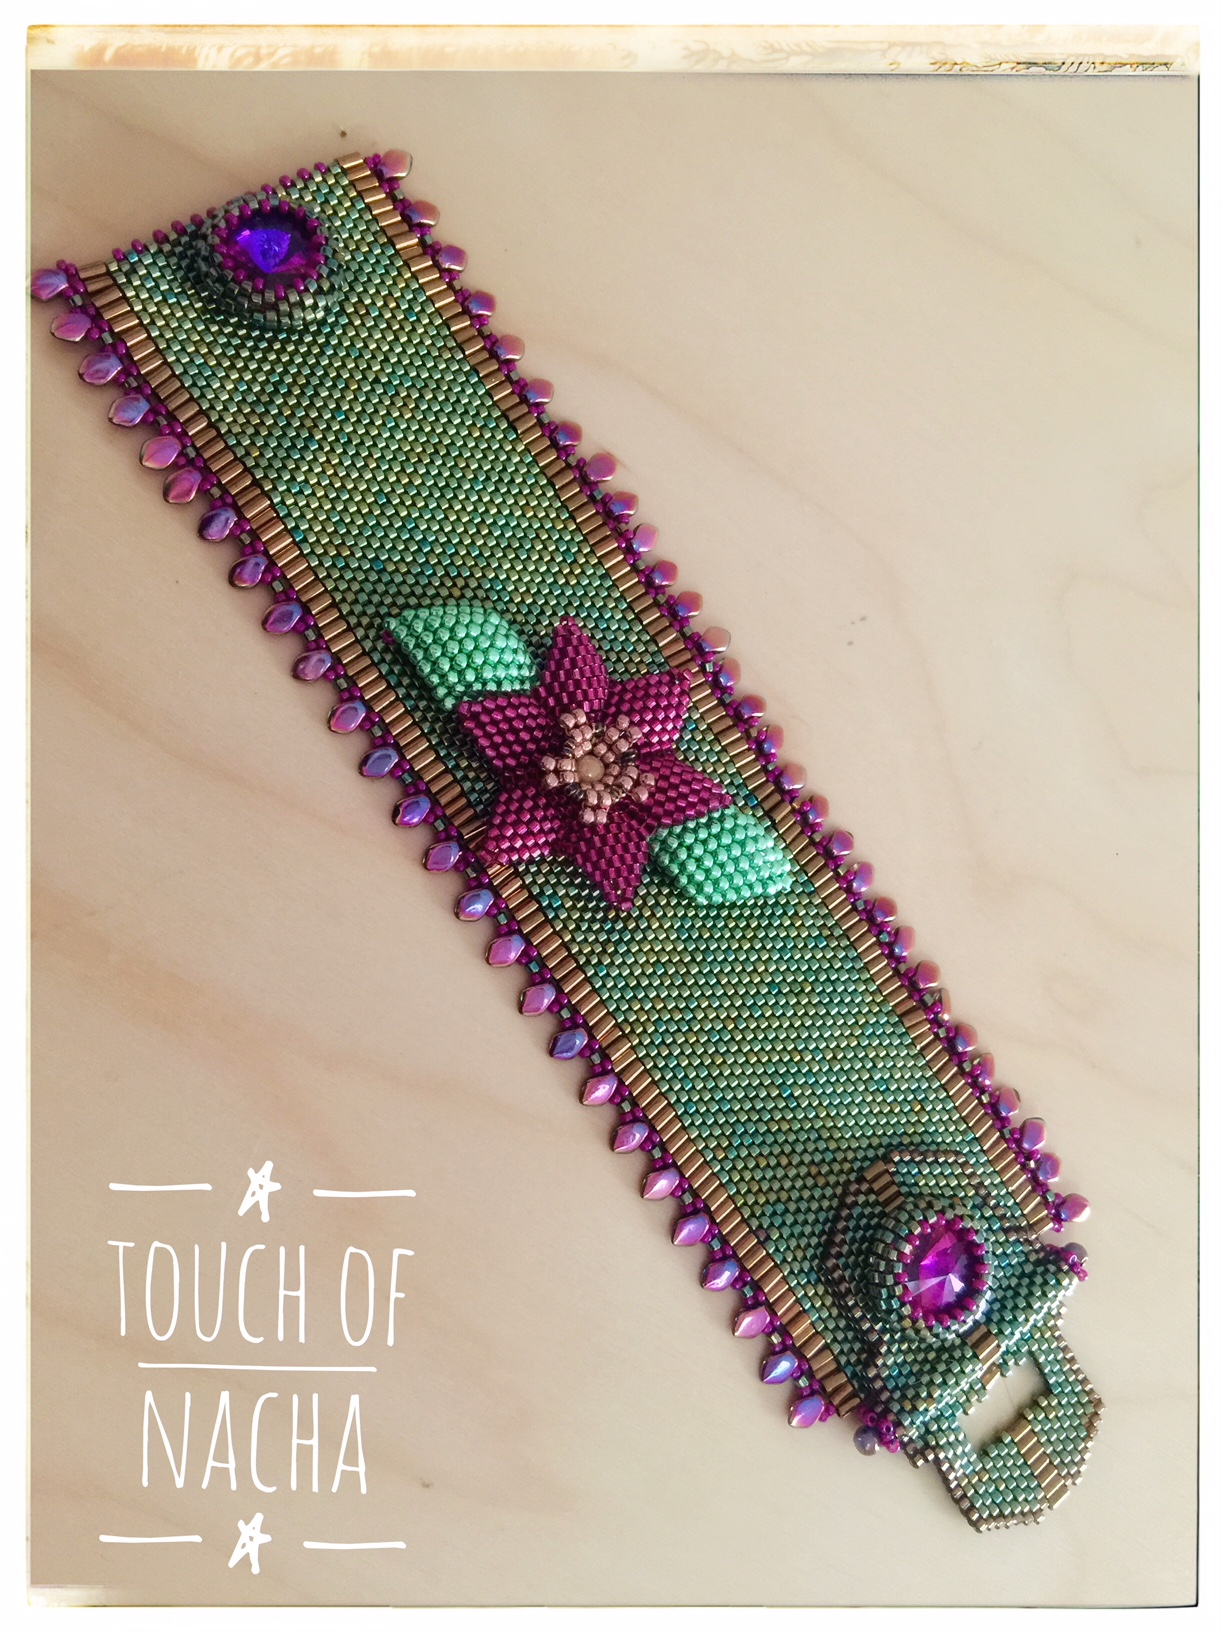 004_TouchOfNacha